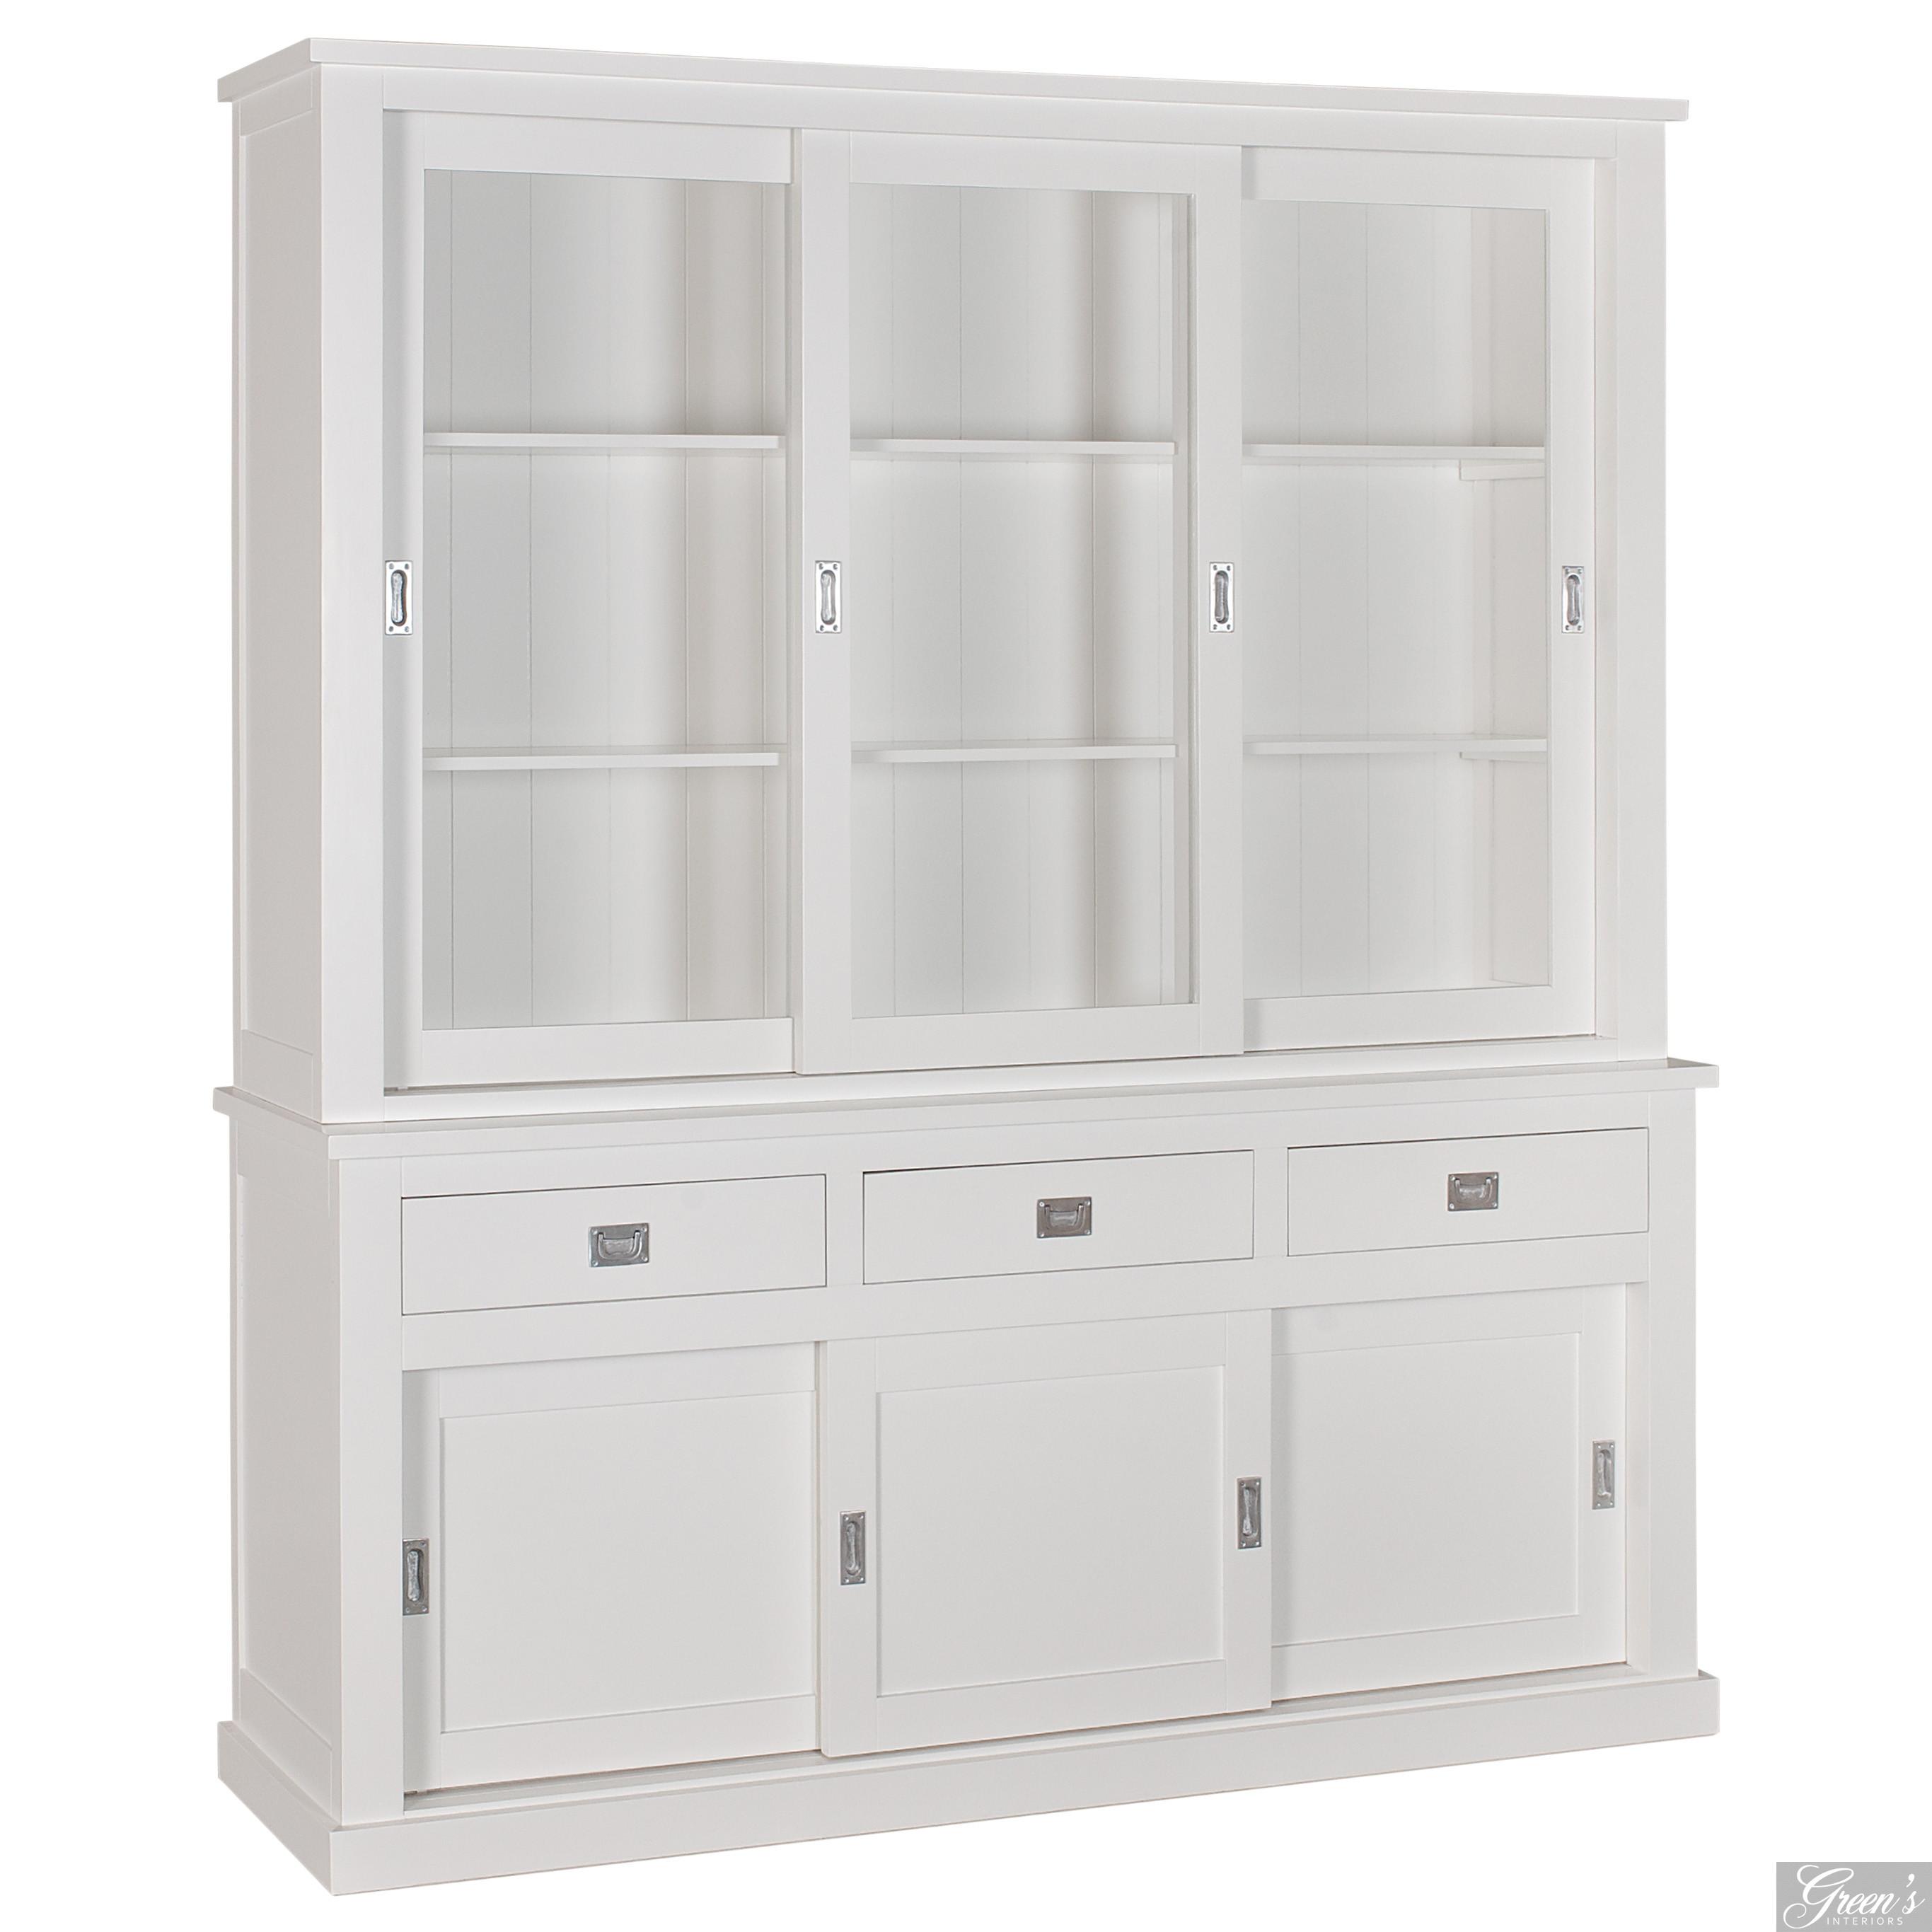 richmond interiors online dam 2000 ltd co kg. Black Bedroom Furniture Sets. Home Design Ideas